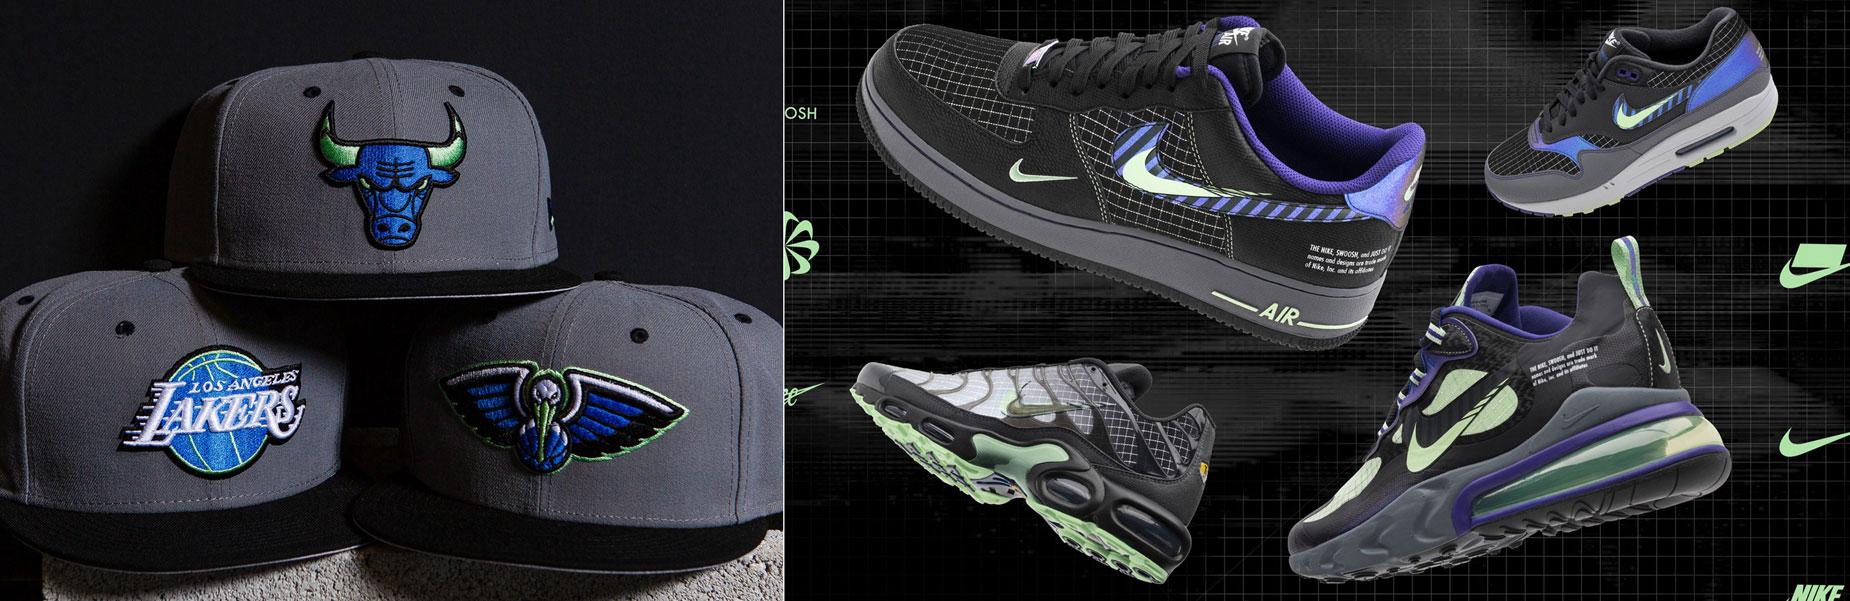 nike-future-swoosh-snapback-hats-to-match